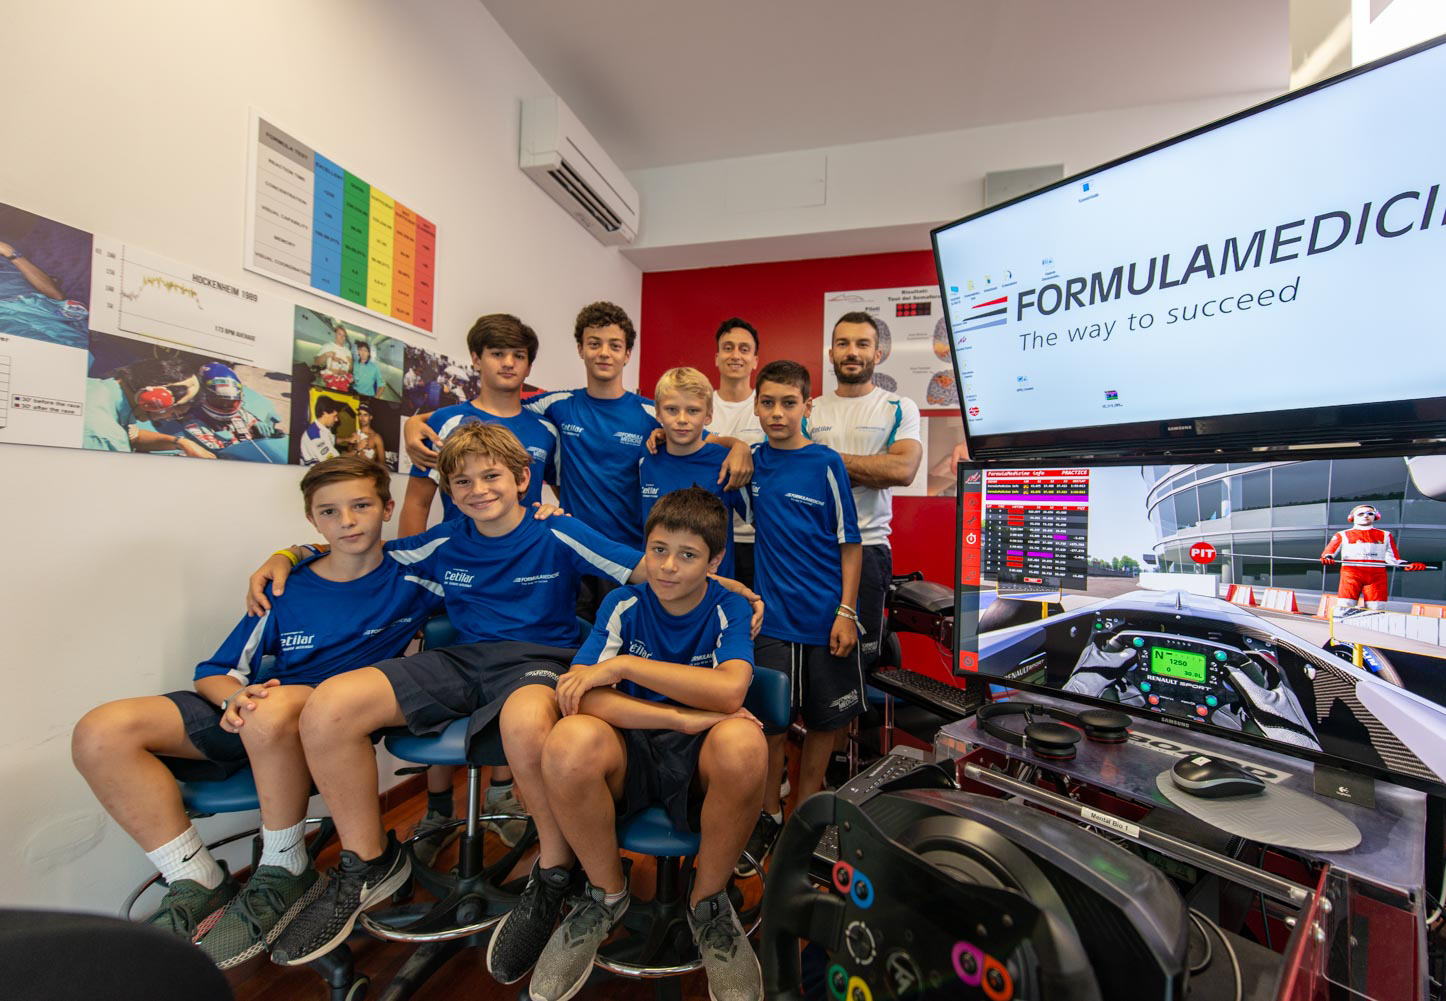 Formula Medicine a quota 509 presenze su 1018 GP di Formula 1